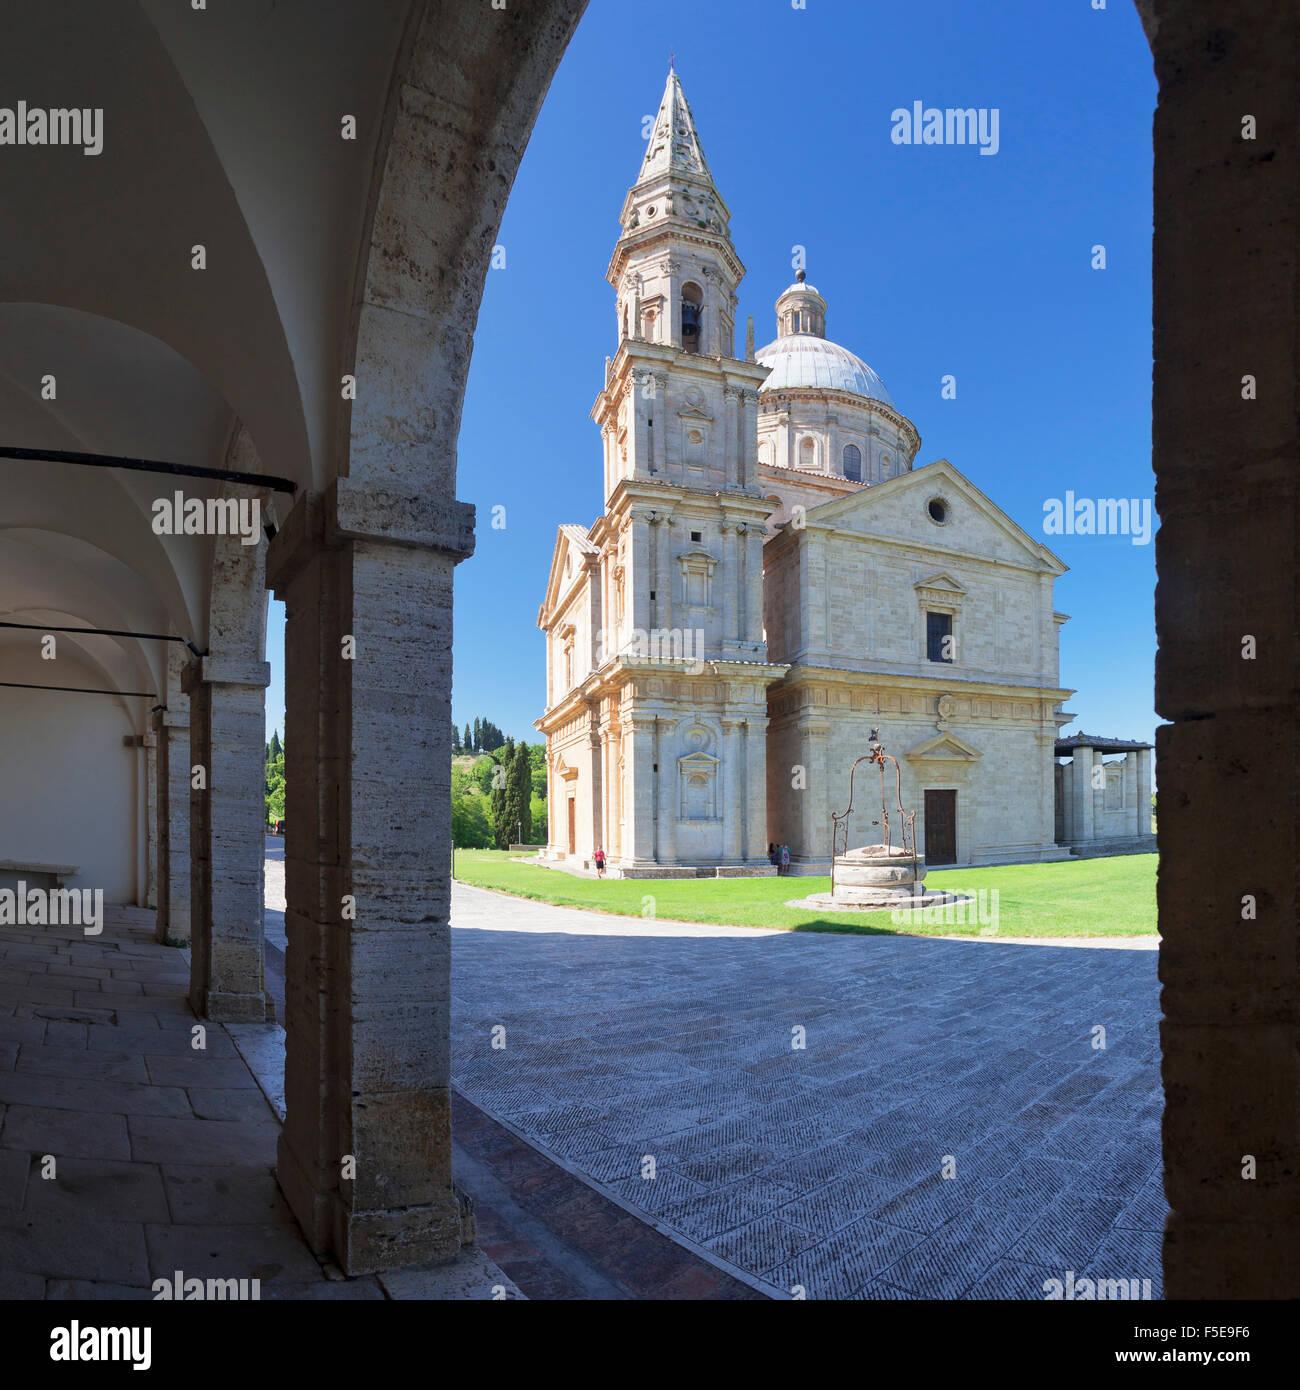 Iglesia de San Biagio, Montepulciano, provincia de Siena, Toscana, Italia, Europa Imagen De Stock